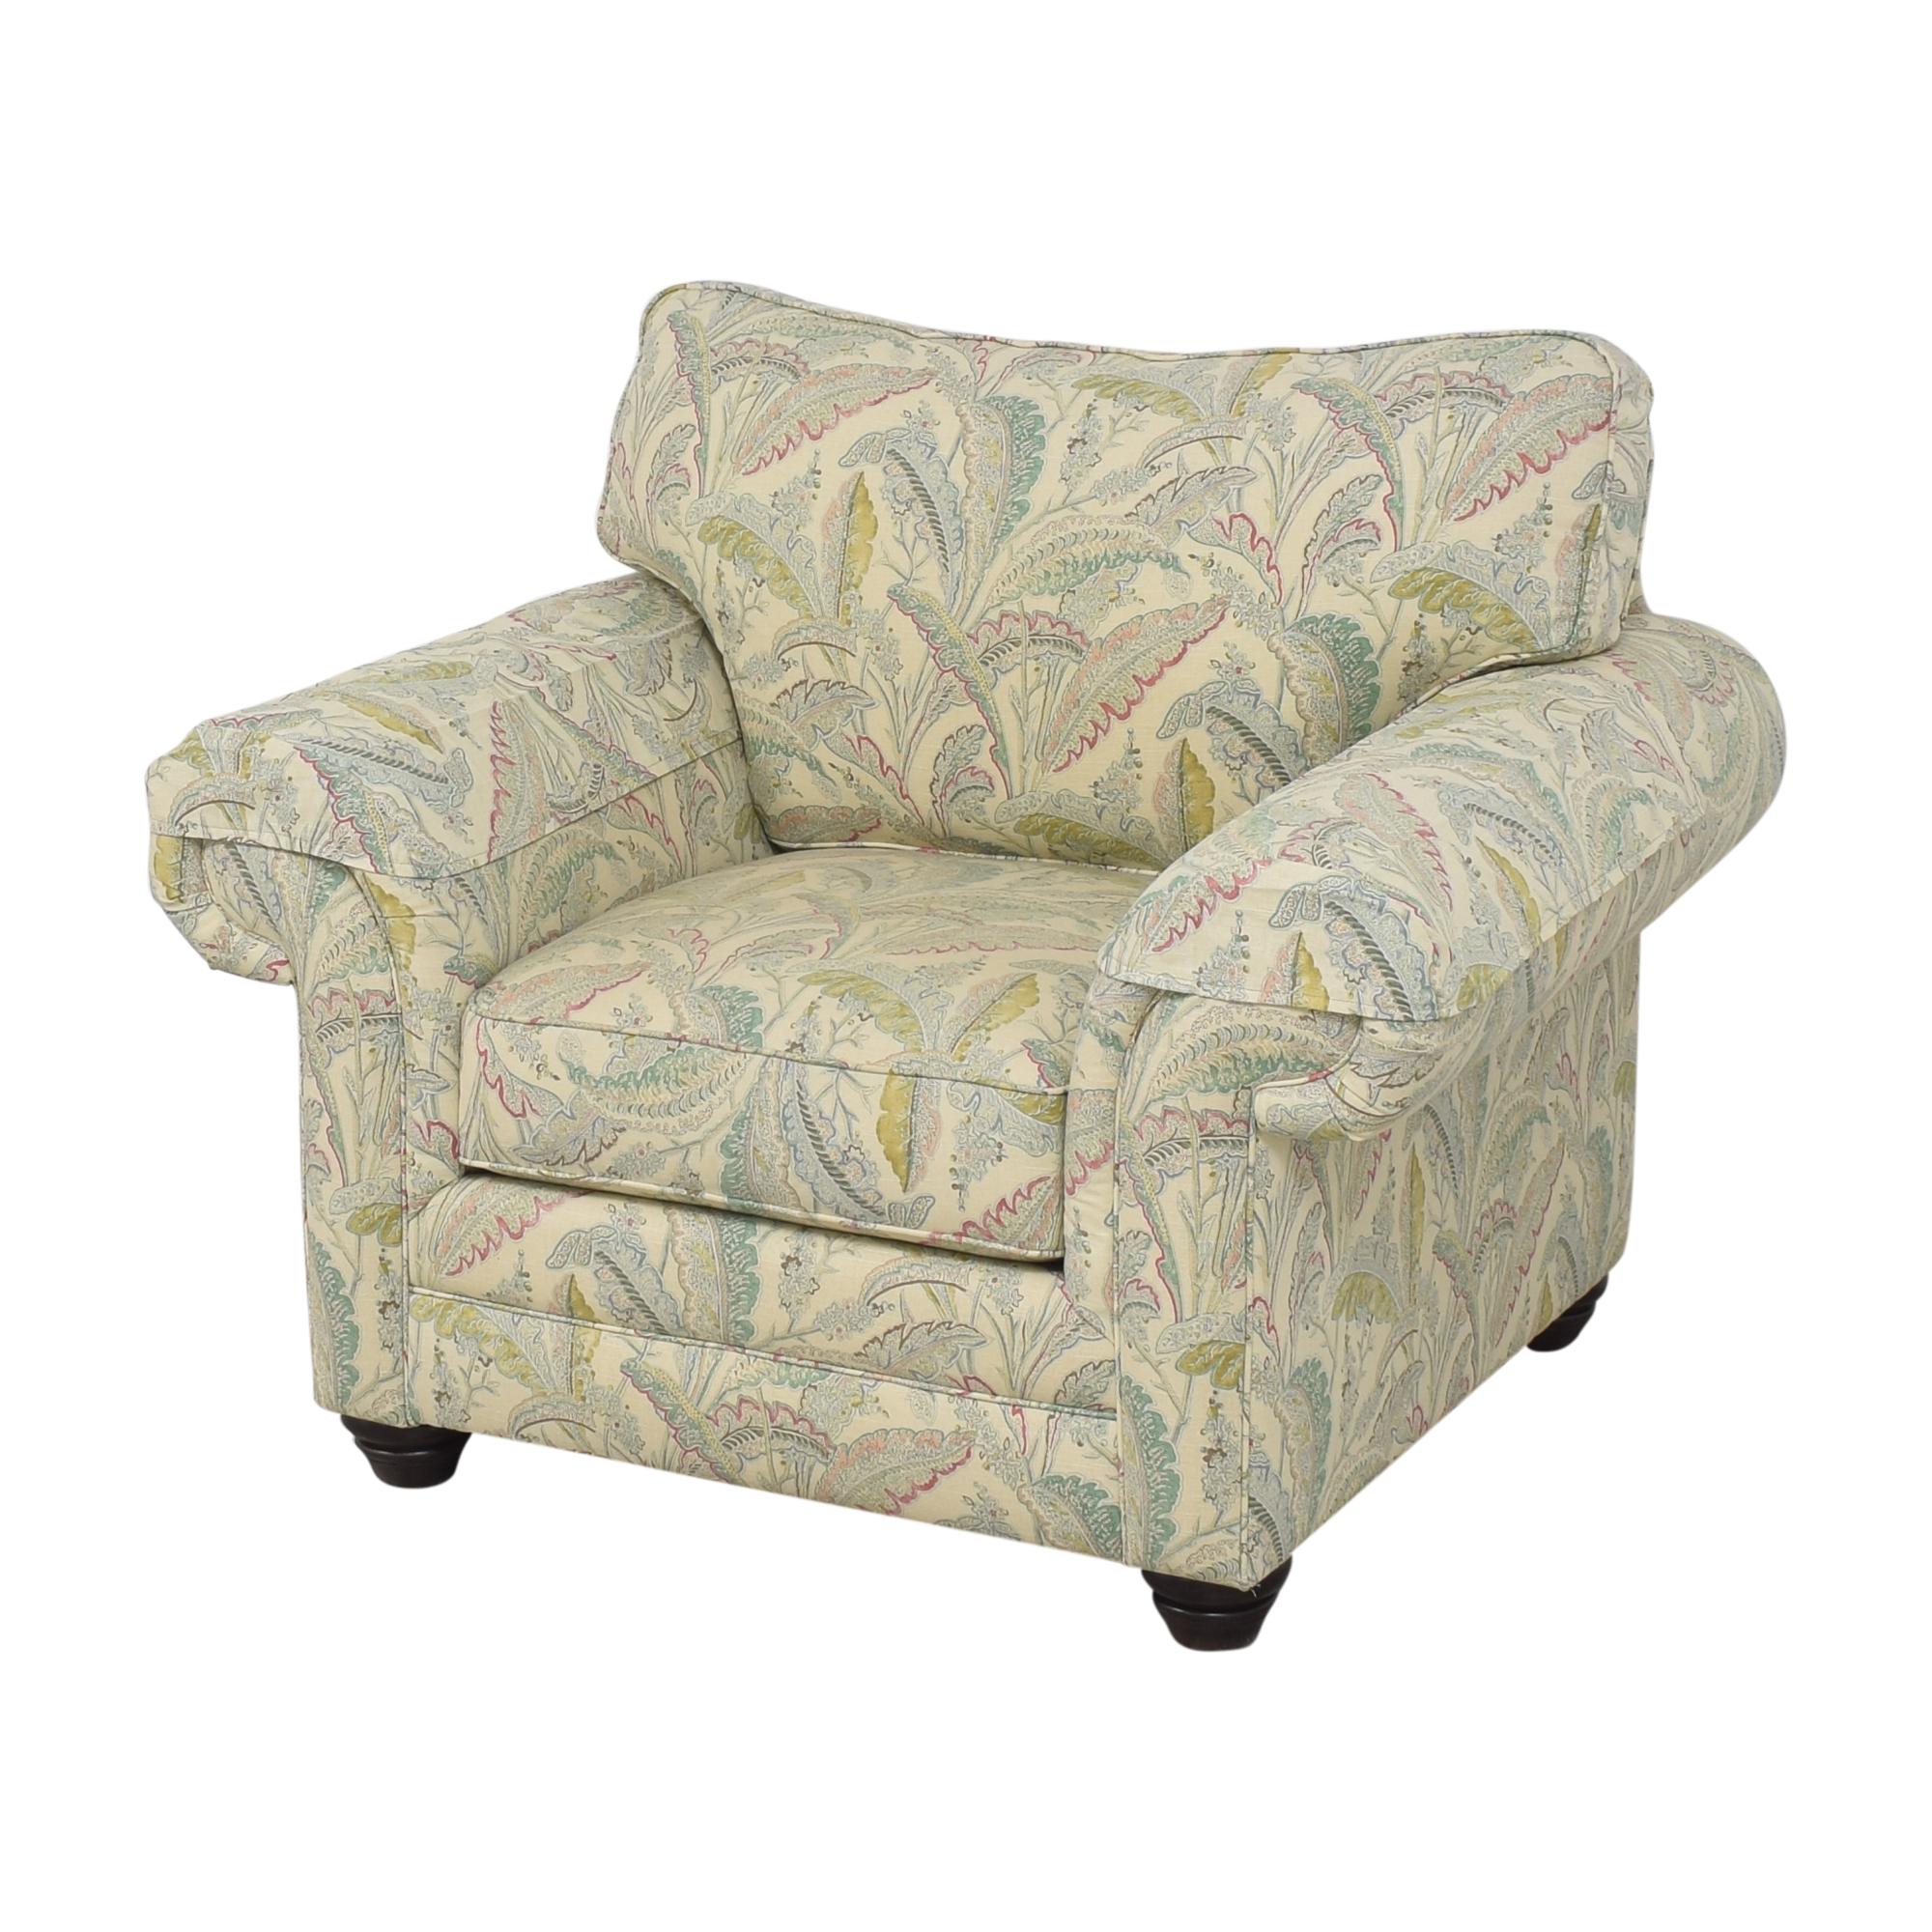 shop Bassett Furniture Custom Upholstered Arm Chair Bassett Furniture Chairs